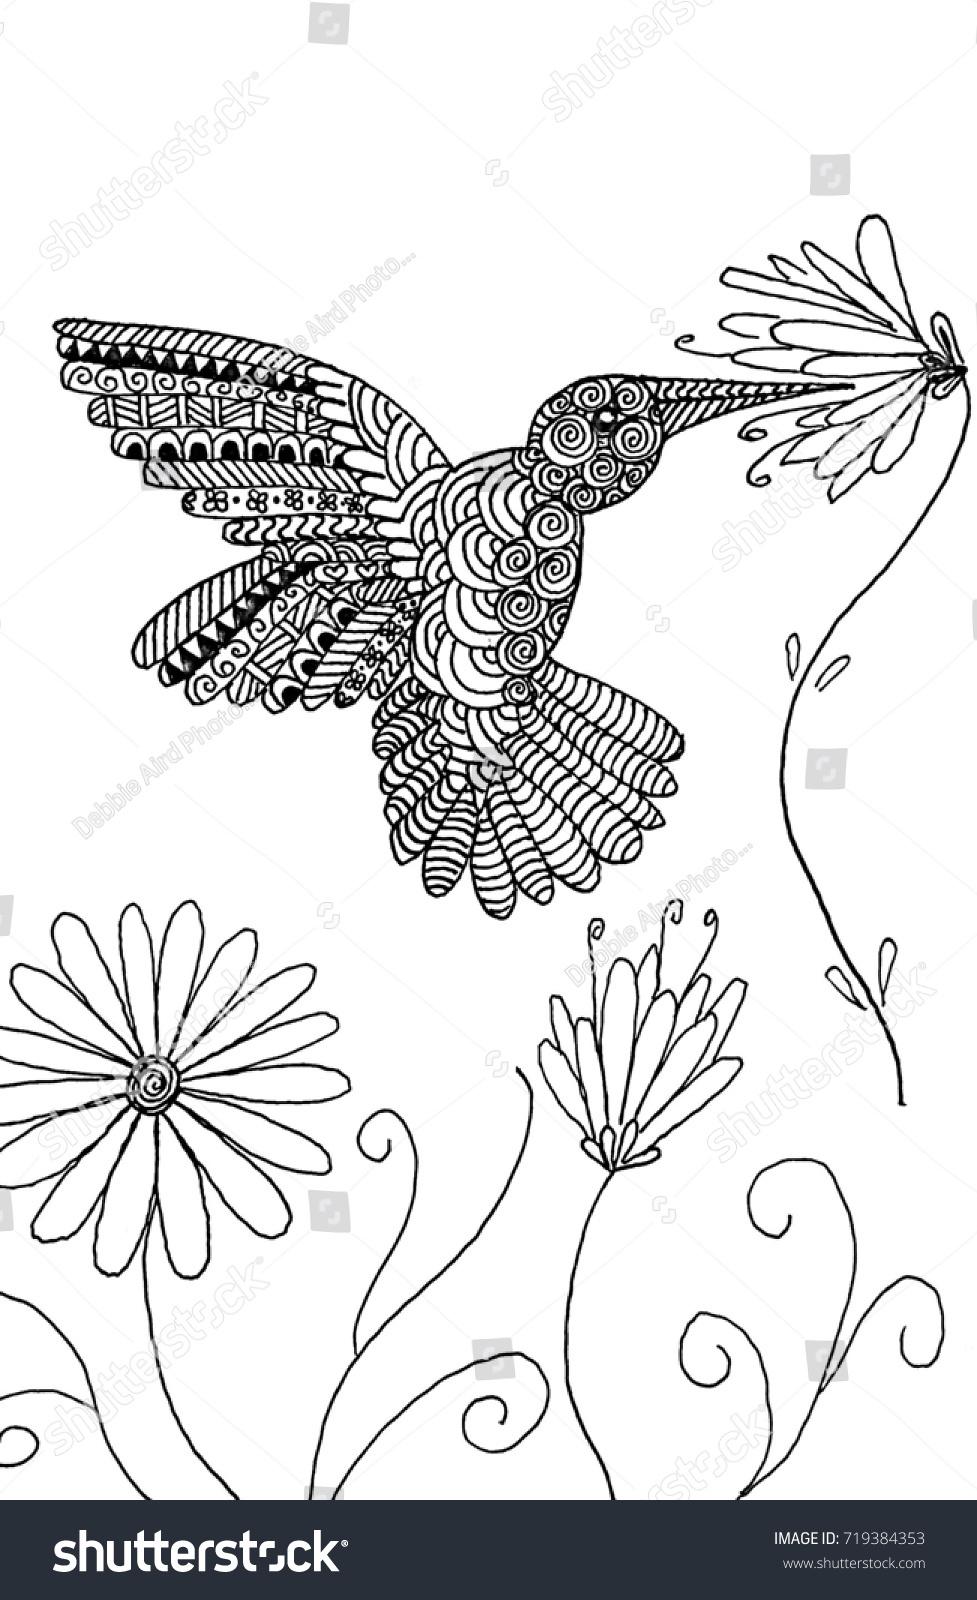 Beautiful Humming Bird Hand Drawn Zentangle Stock Illustration ...